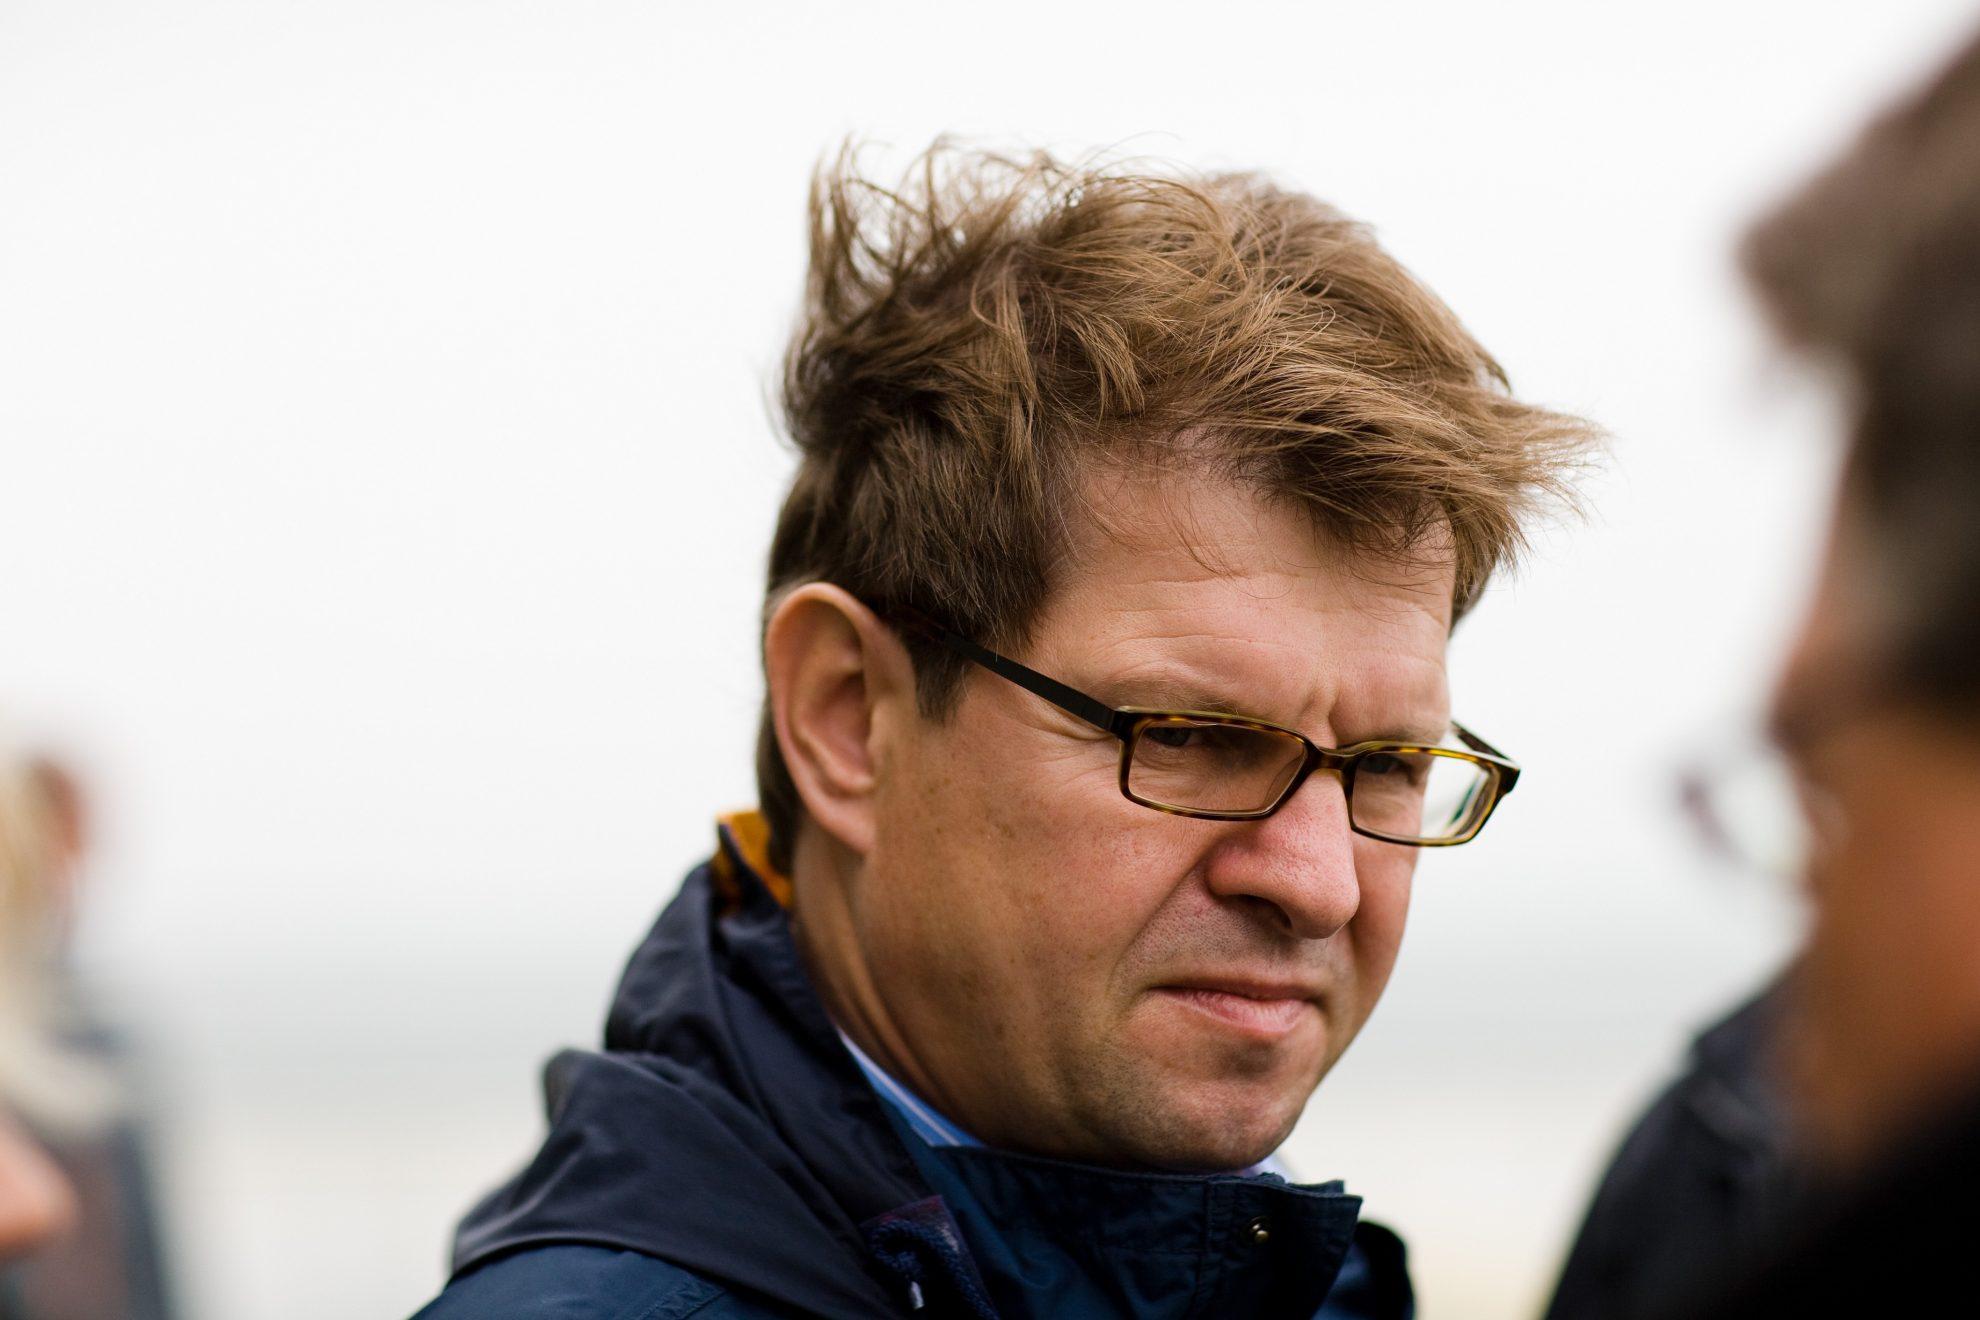 Ralf Stegner auf Amrum